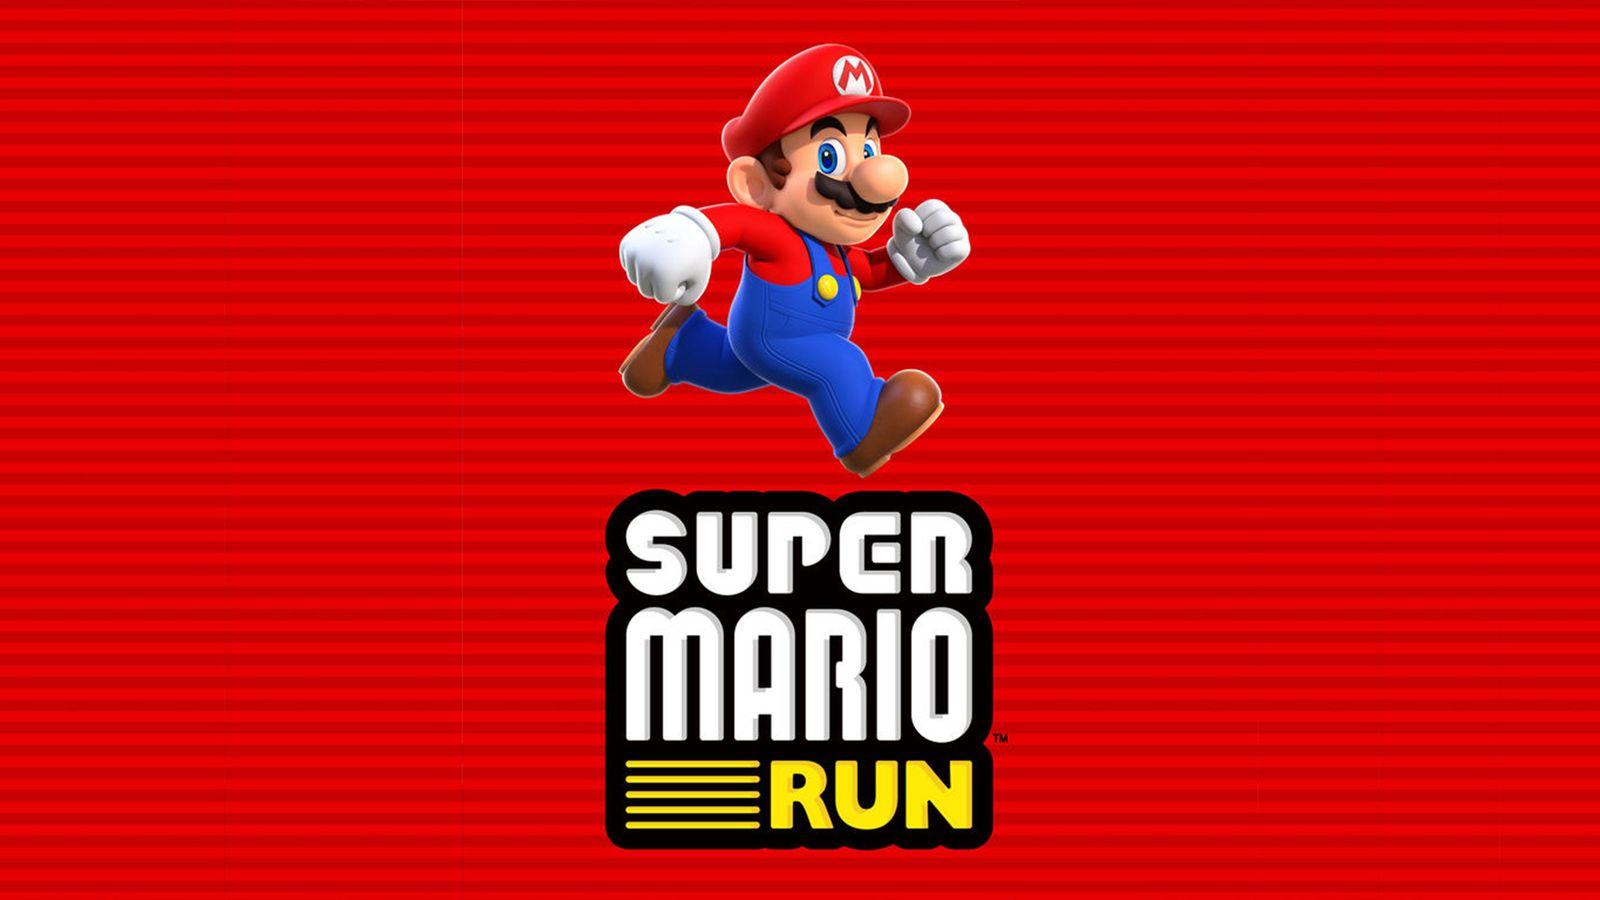 super mario run mod apk all levels unlocked